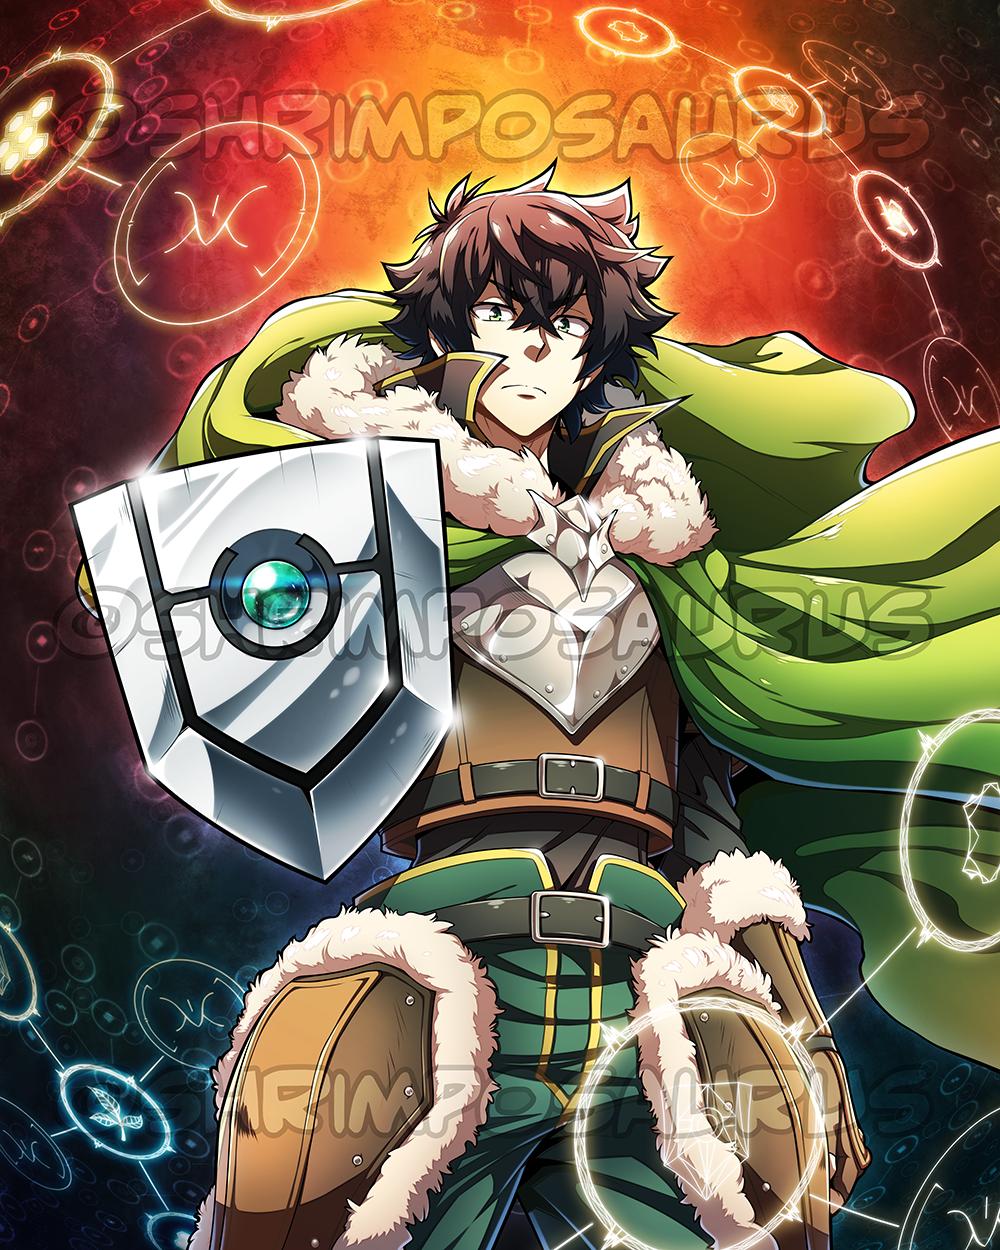 Shield Hero by shrimposaurus on DeviantArt in 2020 Anime